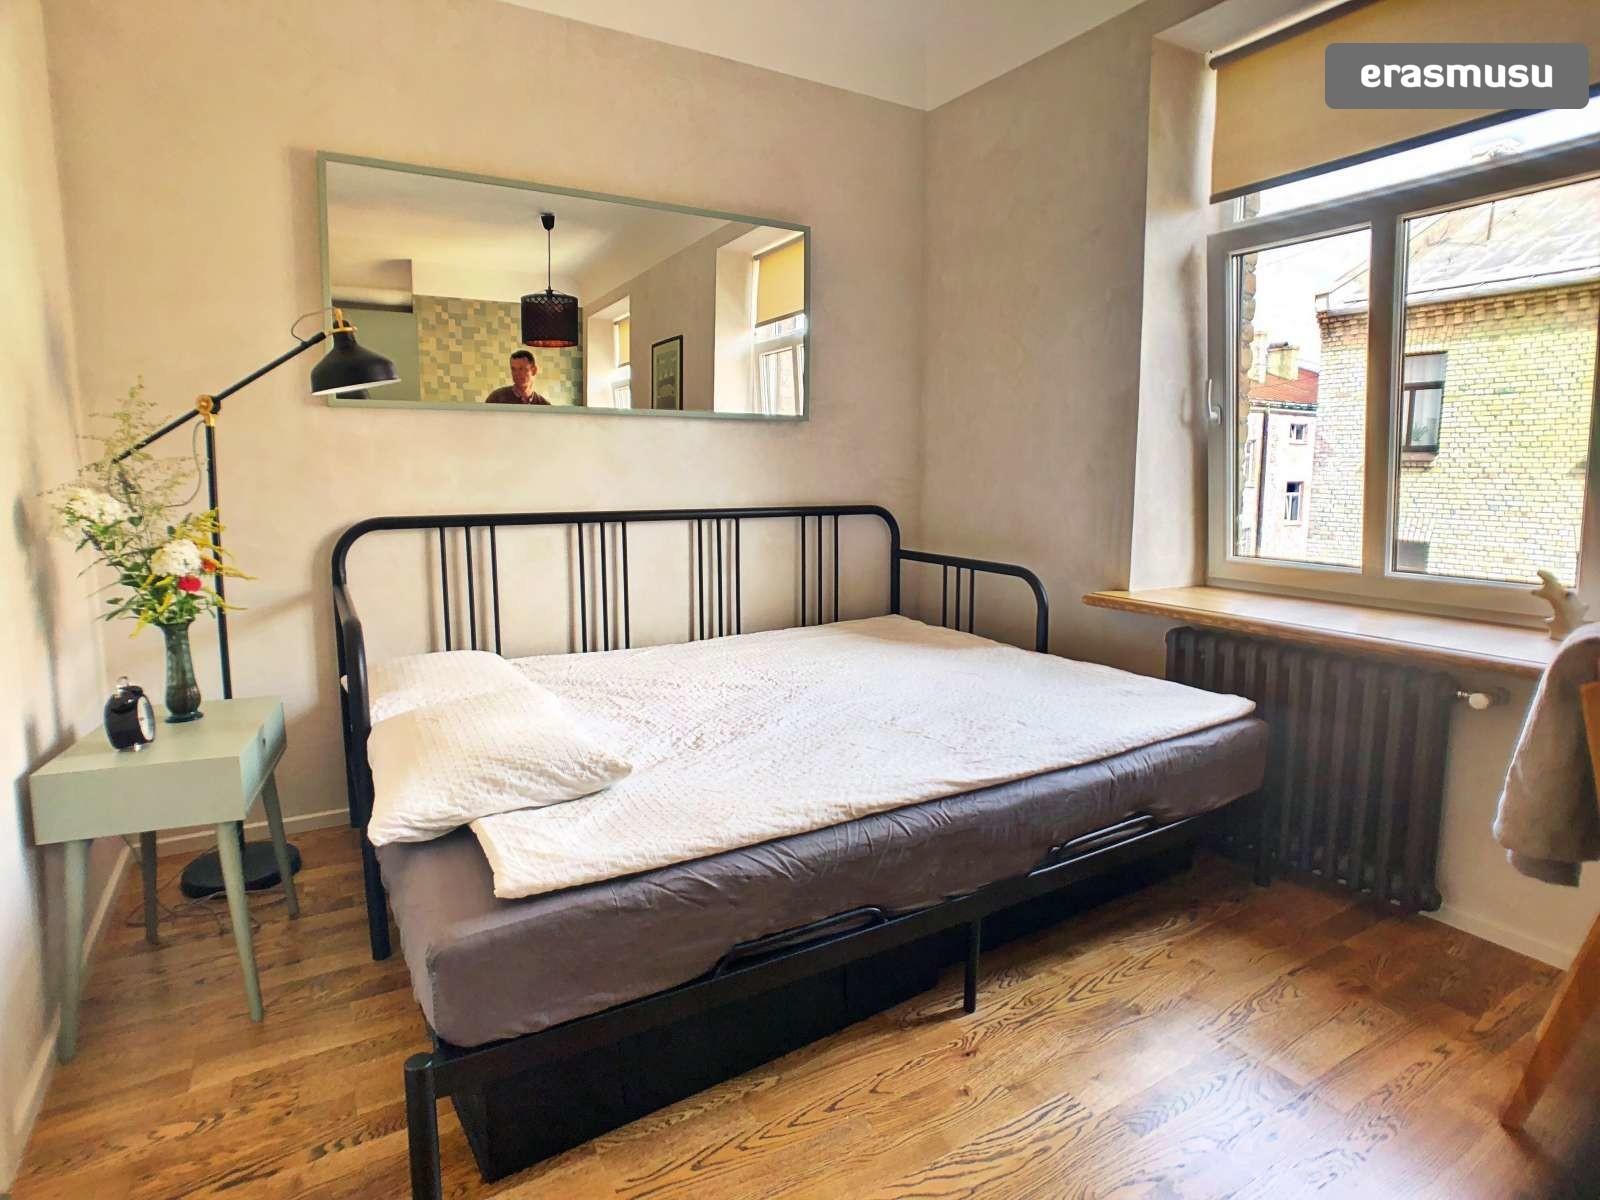 stylish-studio-apartment-rent-grizinkalns-9b57051294247c609ef18f